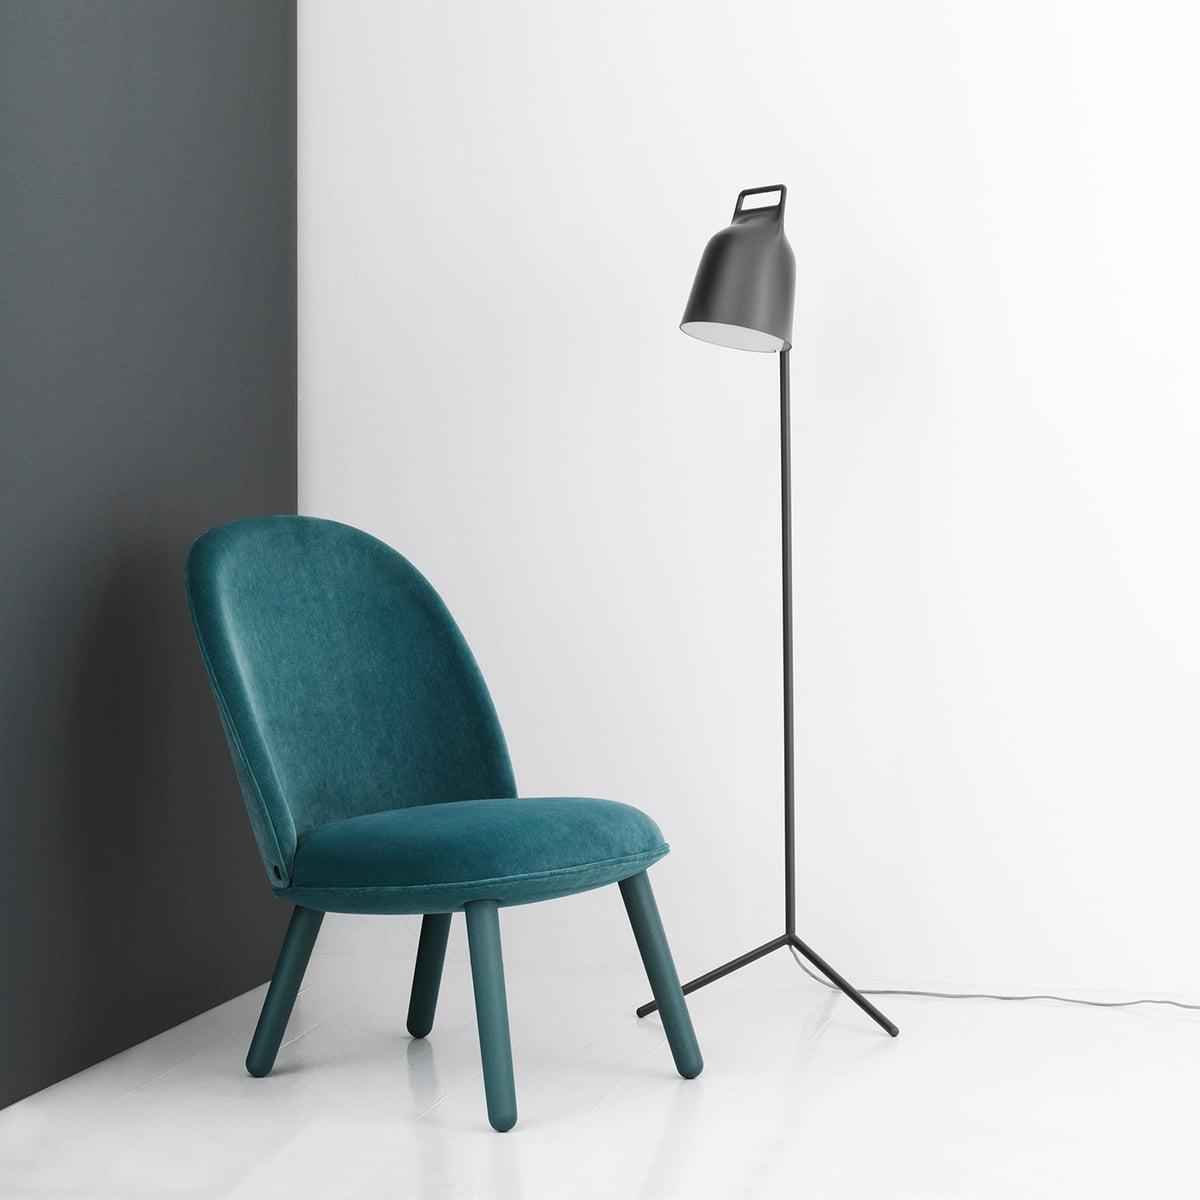 ace lounge chair velour by normann copenhagen. Black Bedroom Furniture Sets. Home Design Ideas